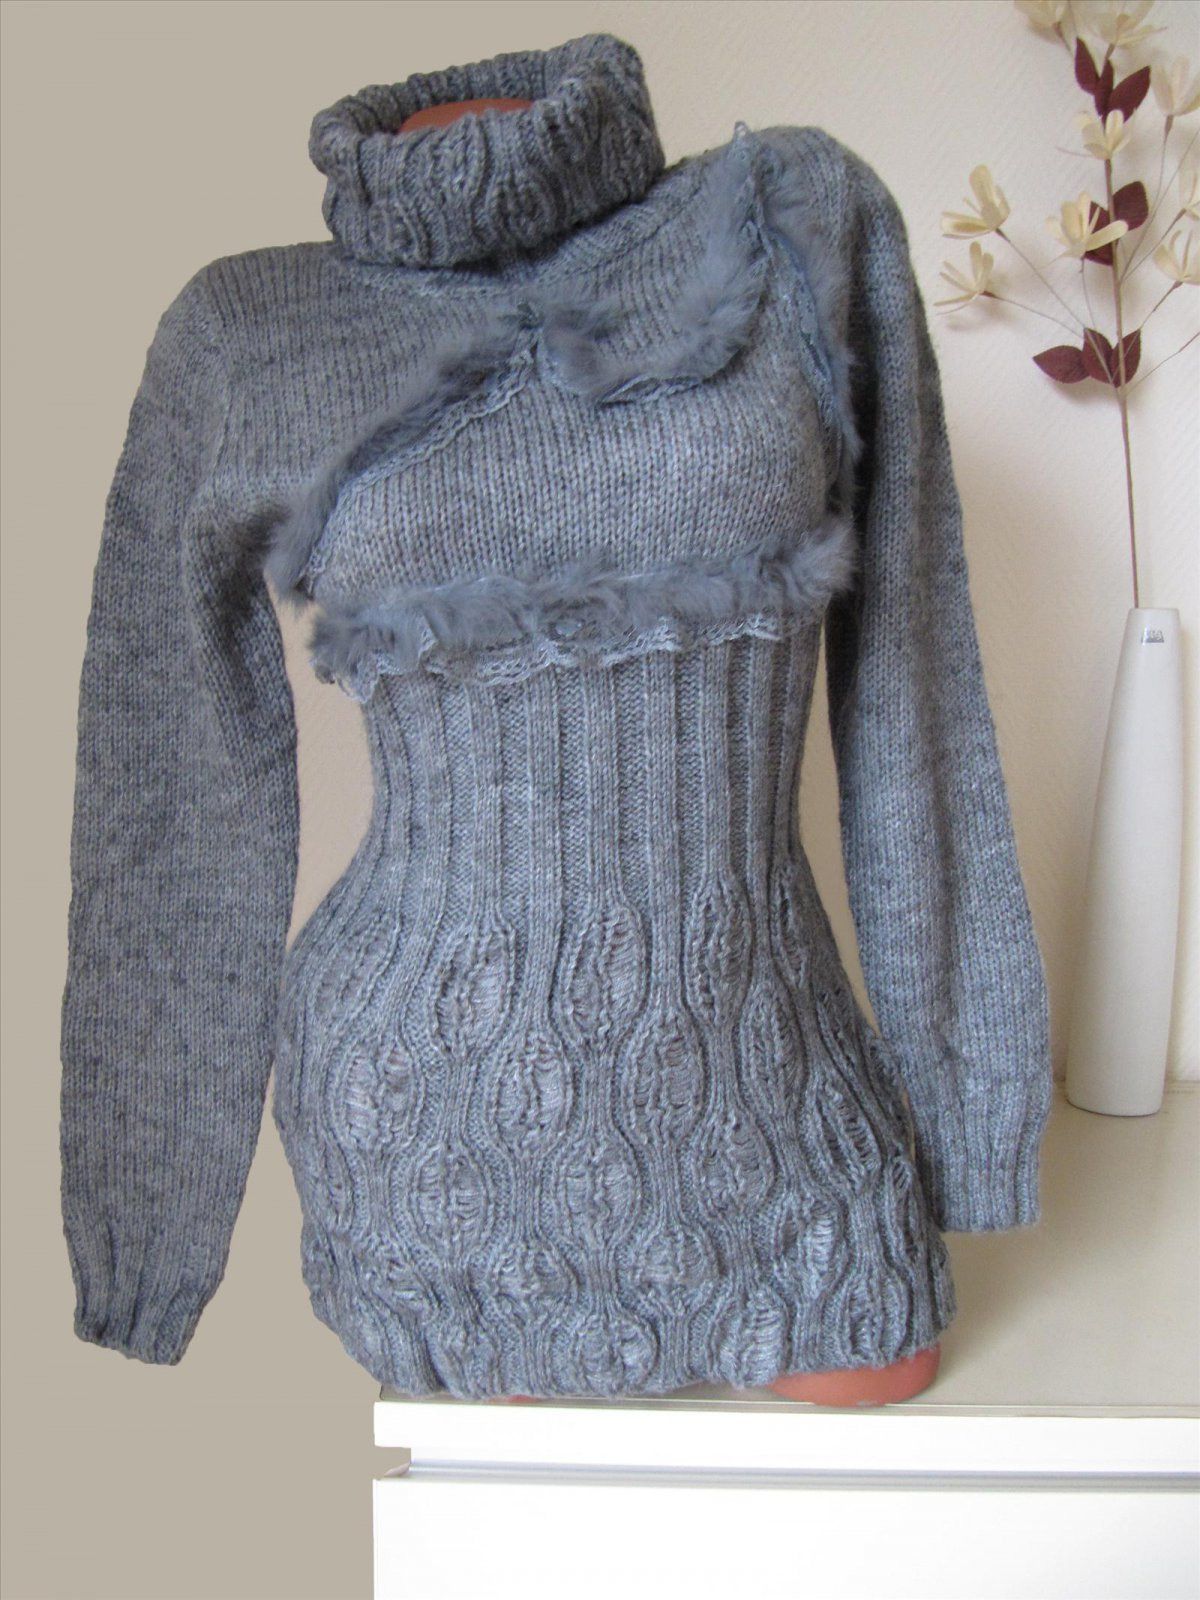 Strick Long Pullover Pulli Kleid Echt Fell Mit Spitze